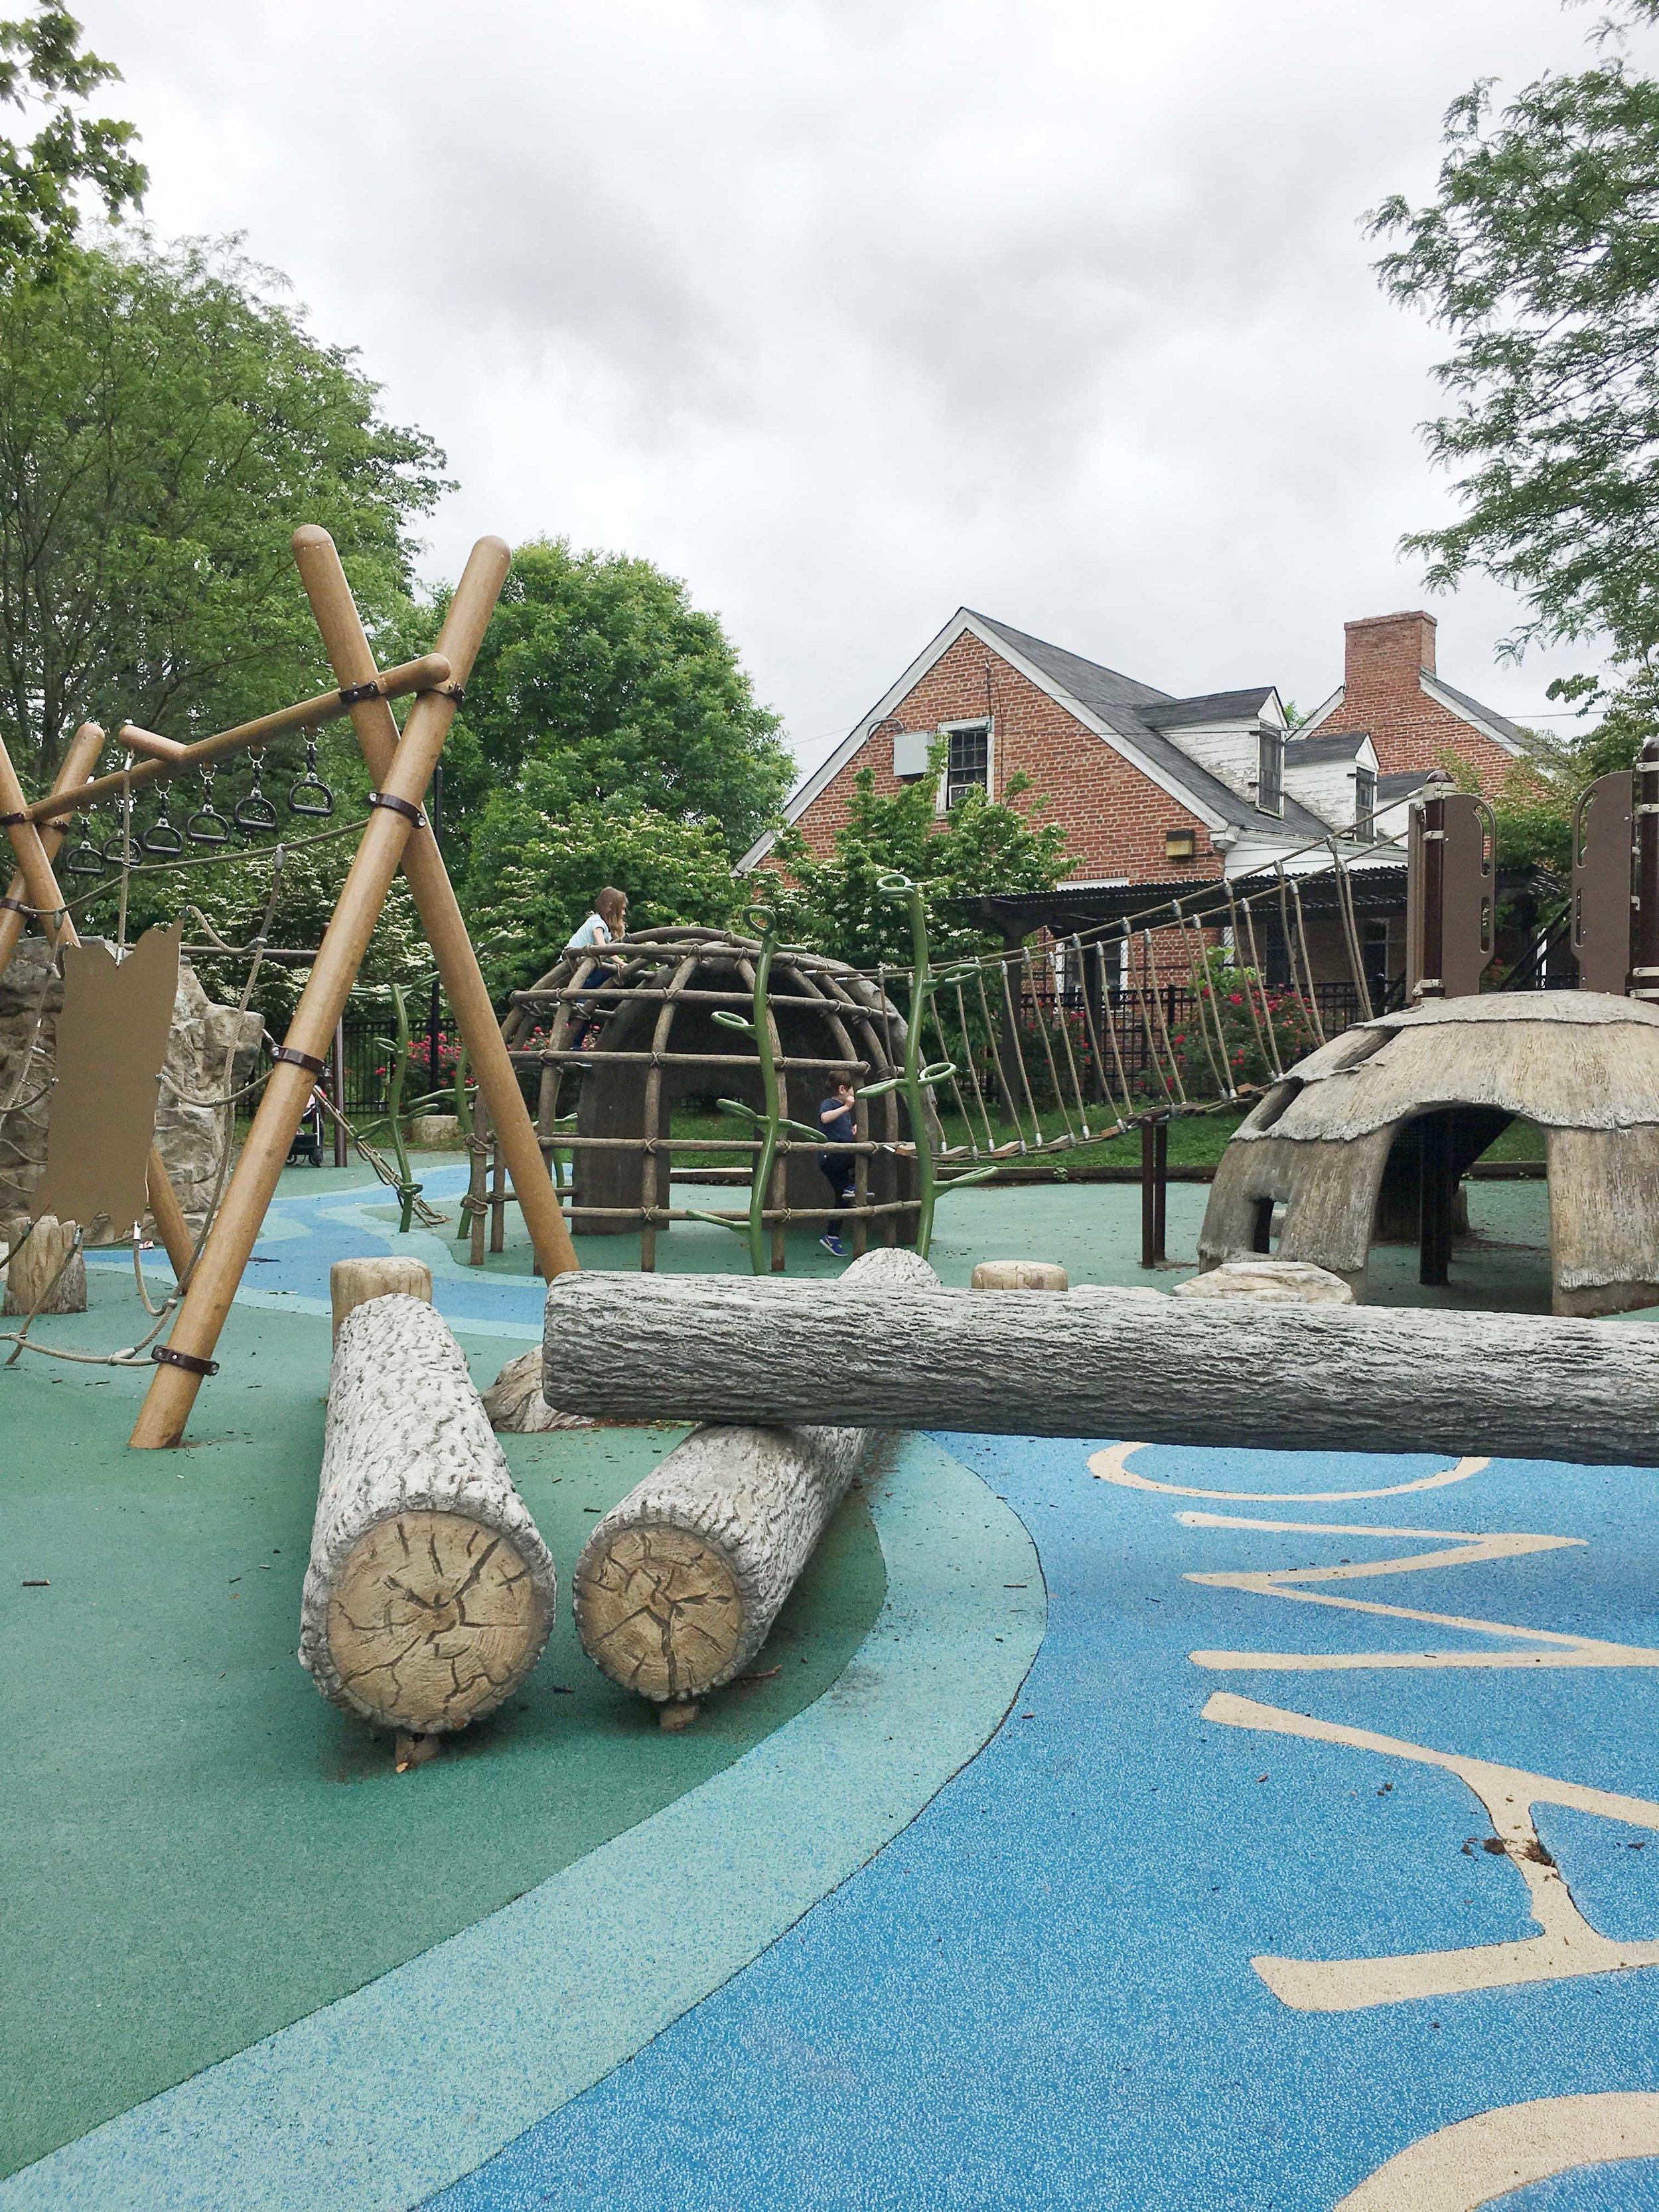 Palisades Playground in Washingston D.C.